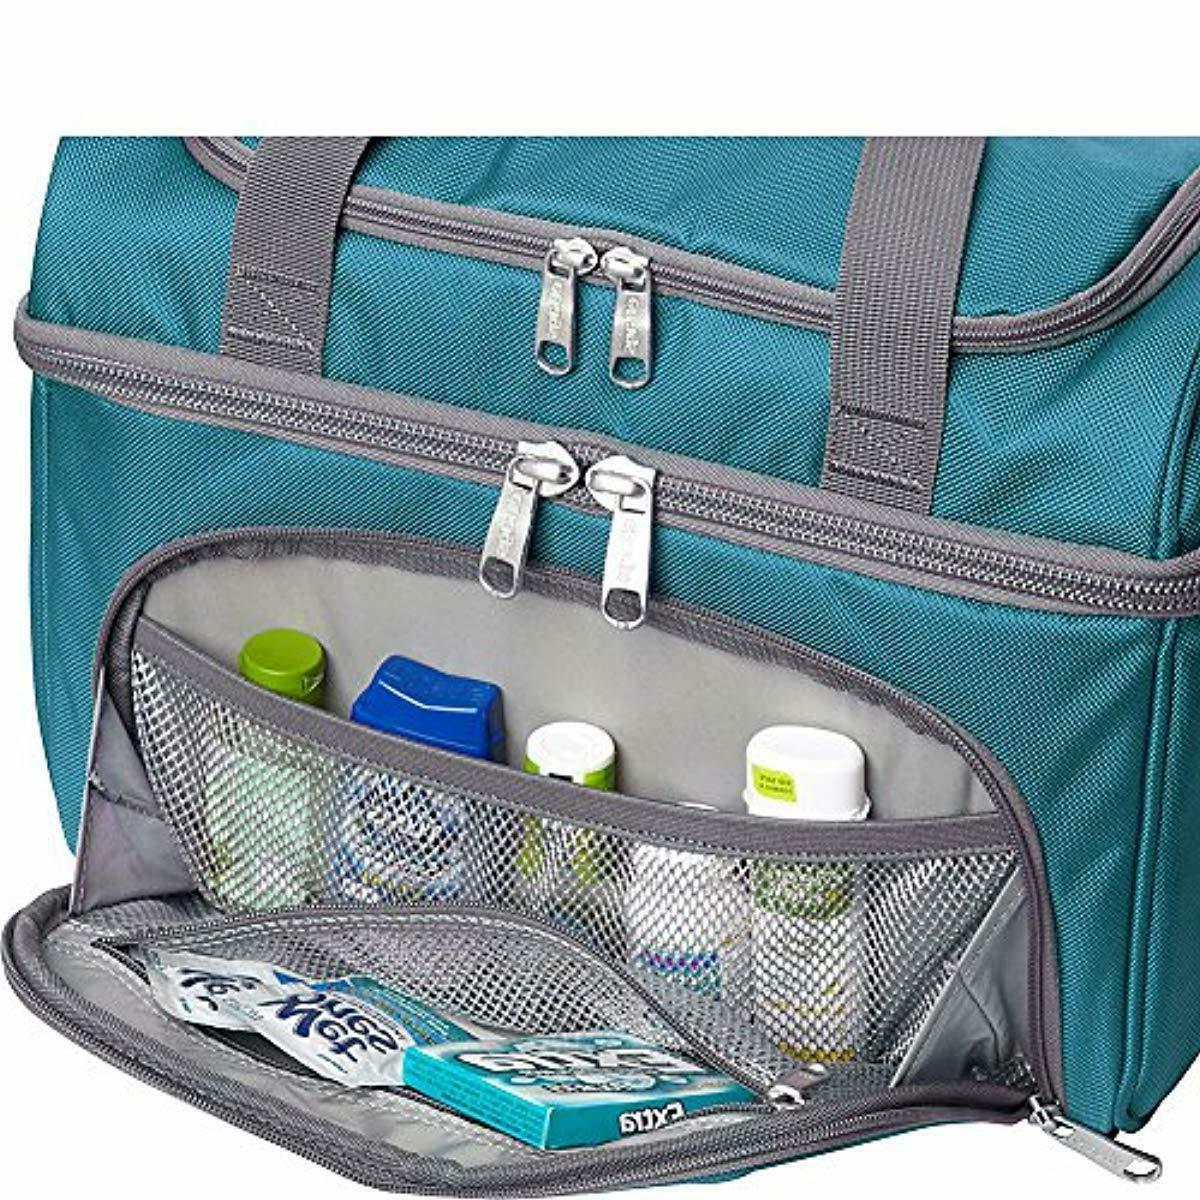 Lunch Box Picnic Luggage